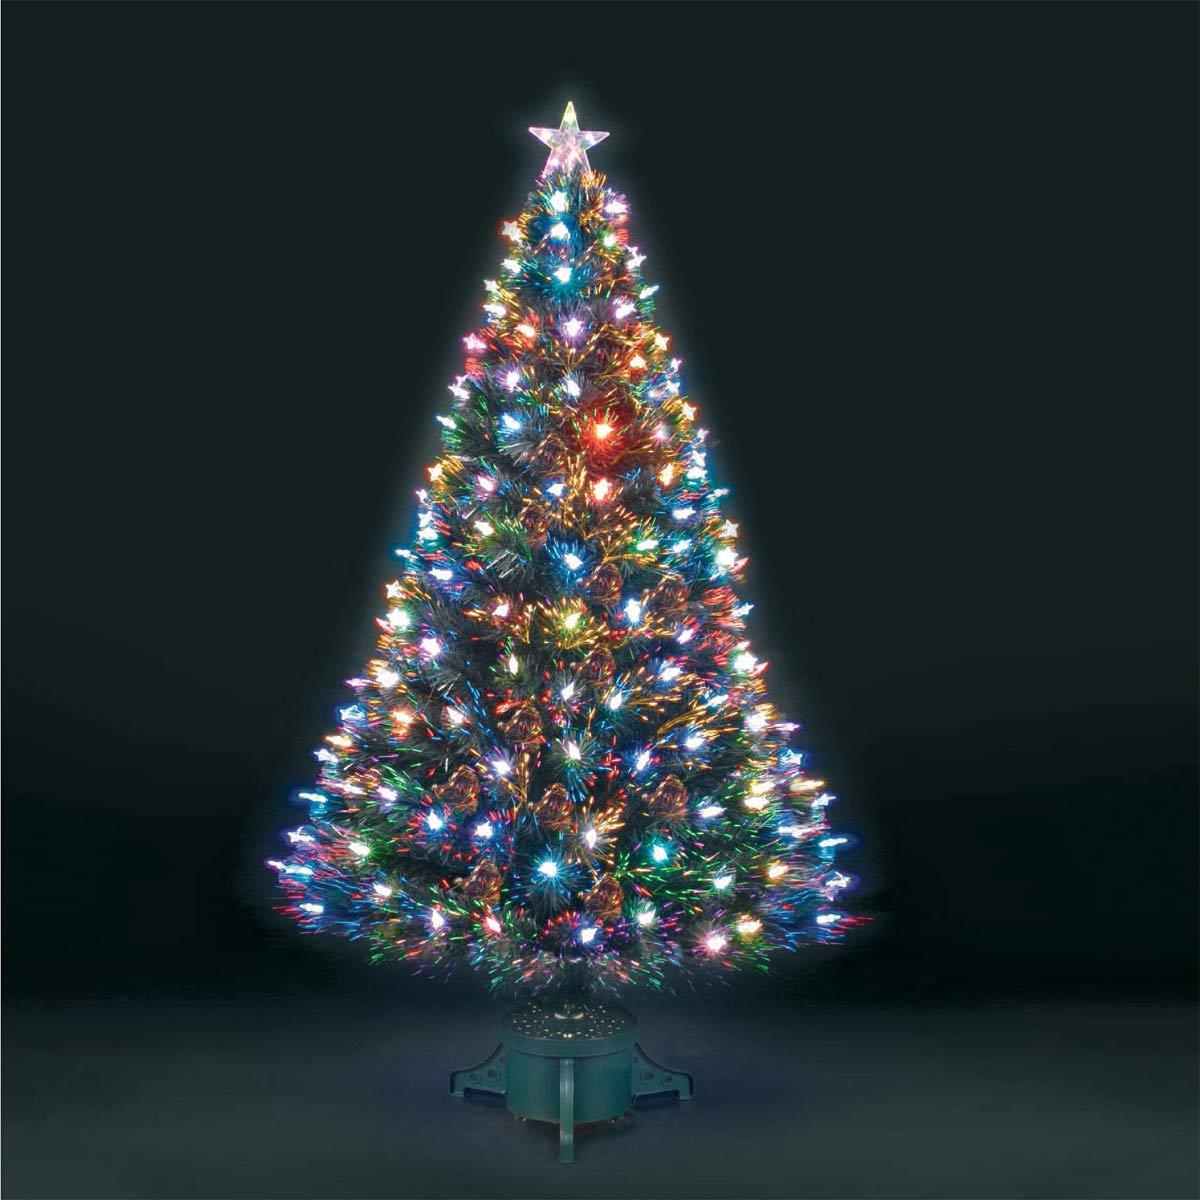 Christmas Tree Fiber Optic Lights: 3ft Superstar Green Fibre Optic & LED Christmas Tree